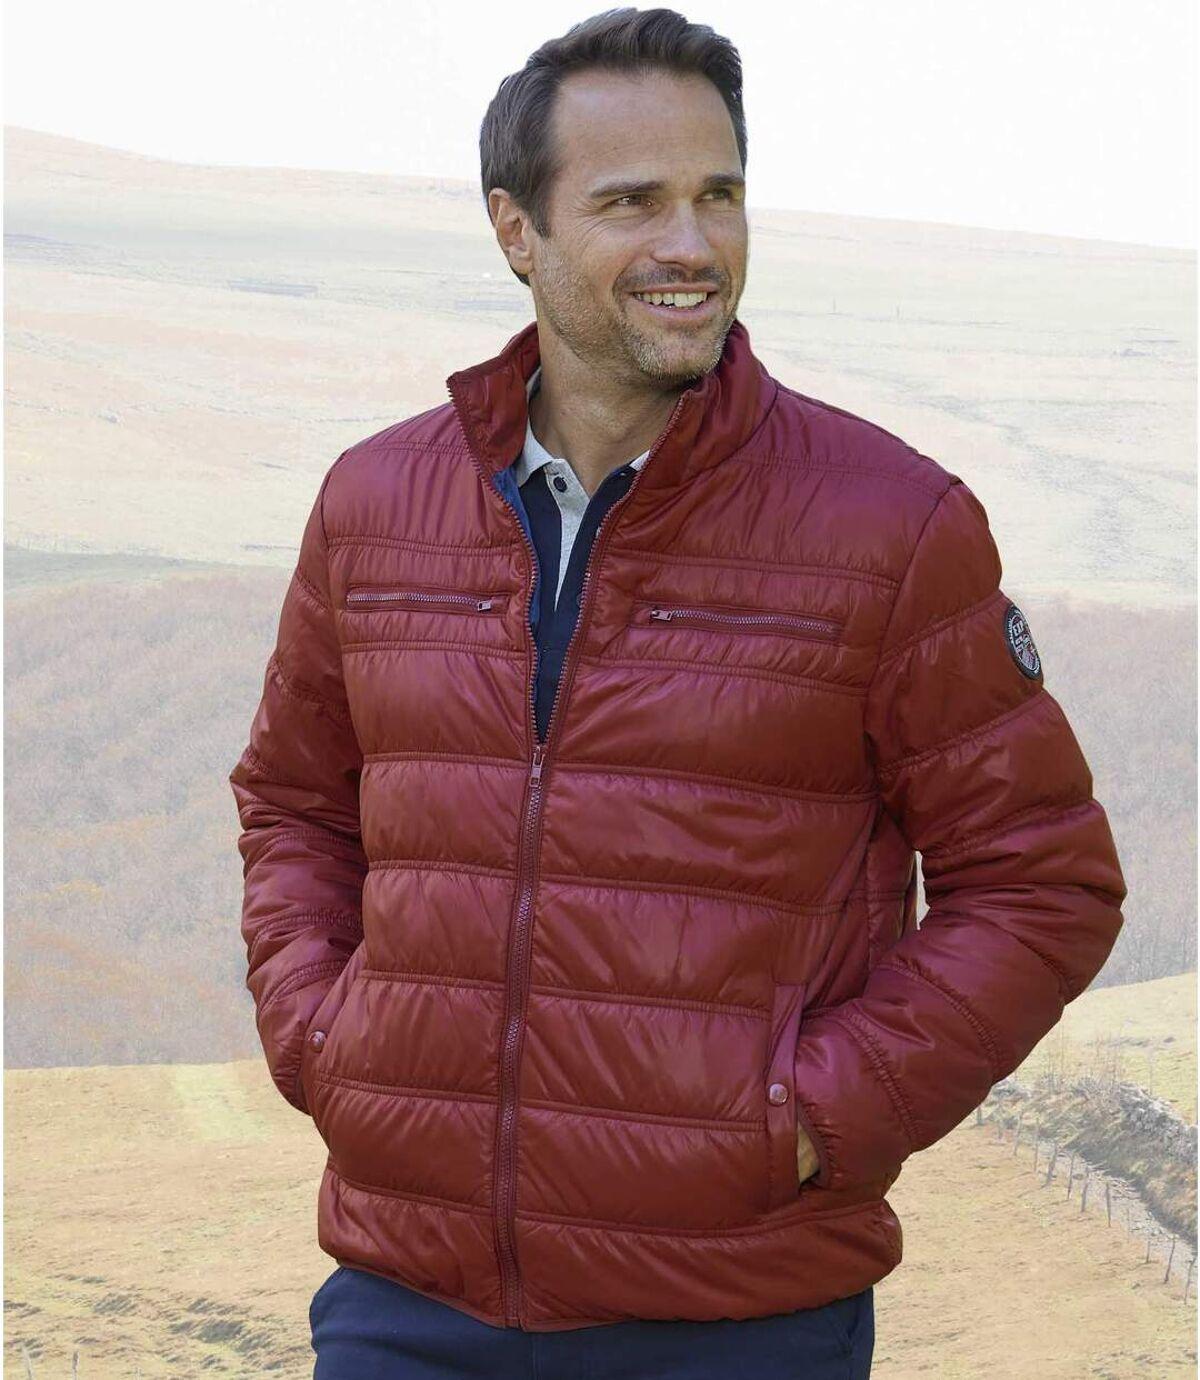 Prešívaná bunda Optimal Confort Atlas For Men